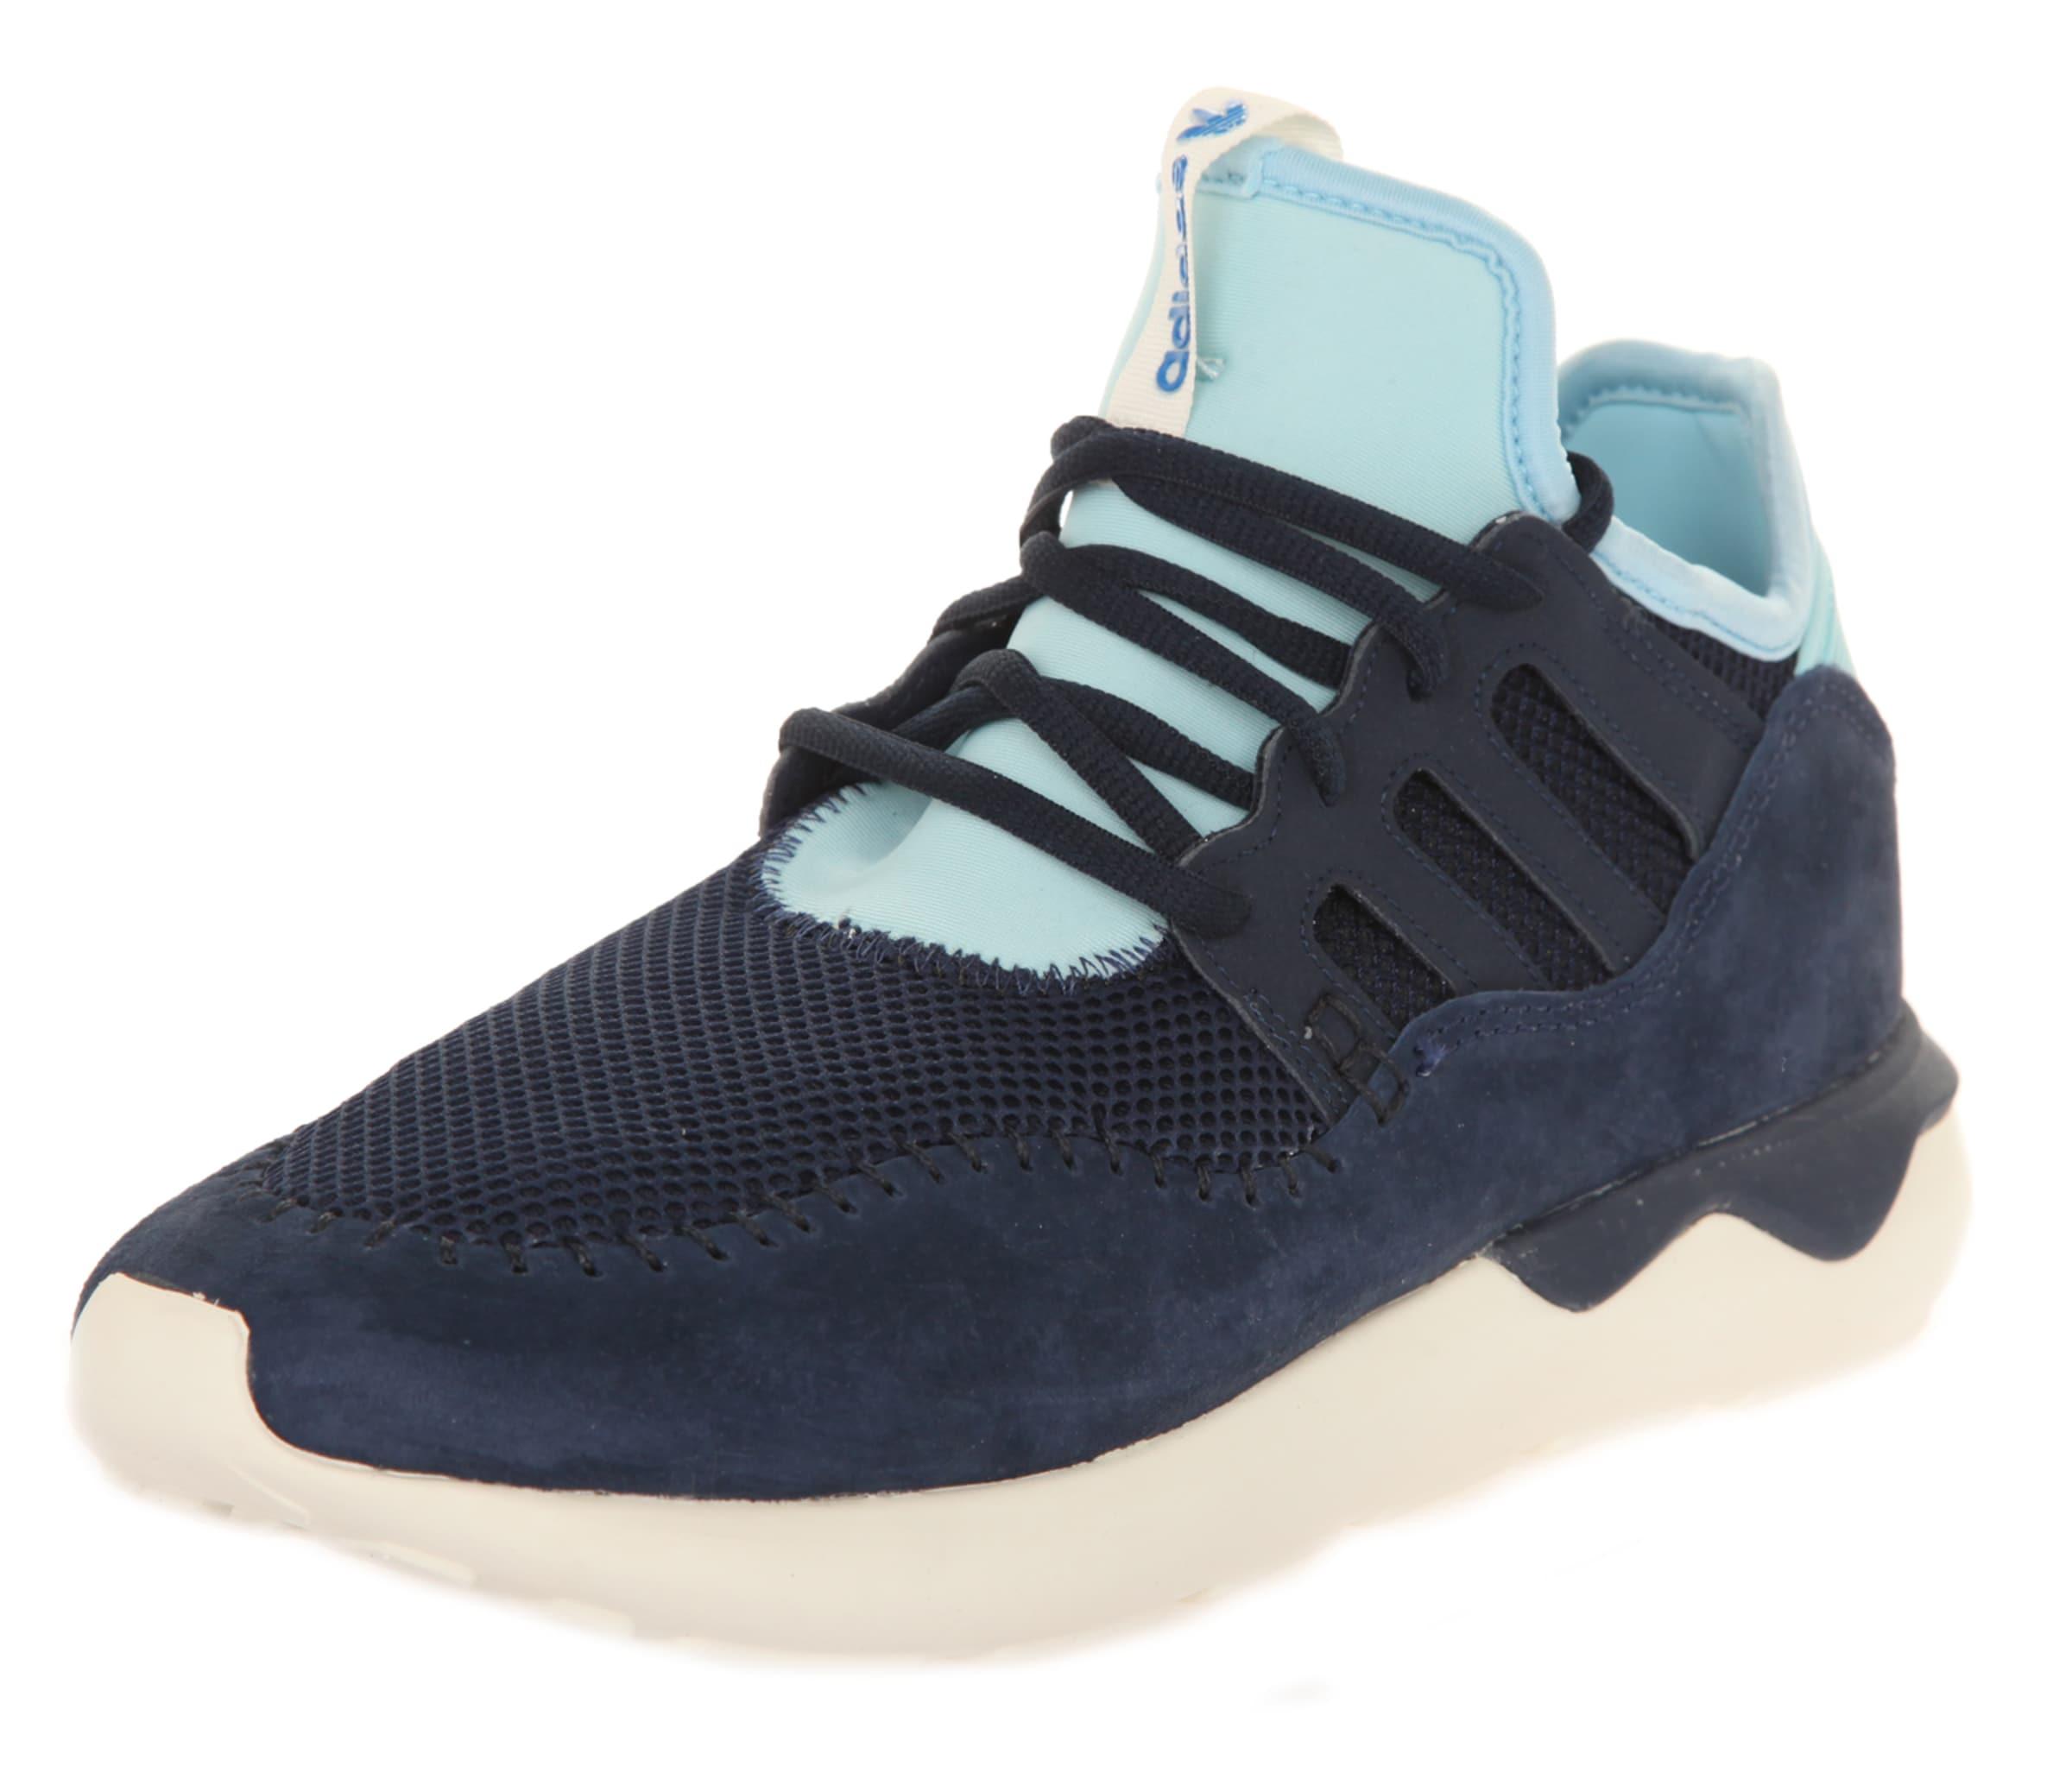 ADIDAS PERFORMANCE Sneaker  Tubular MOC Runner